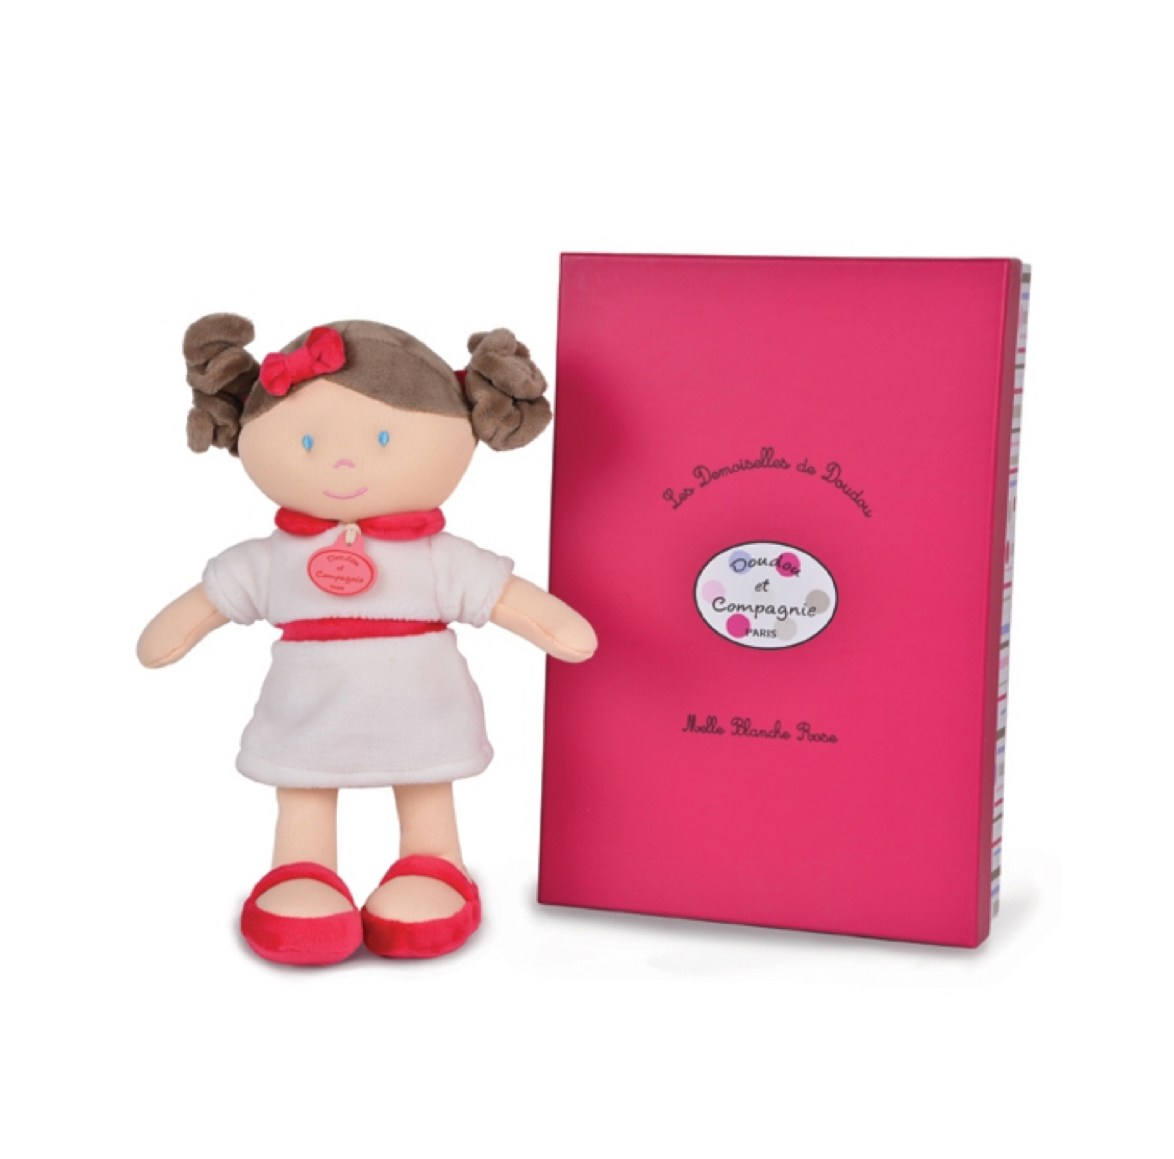 muñeca-douodu-rose-de-doudou-et-compaigne-en-el-mundo-de-mico